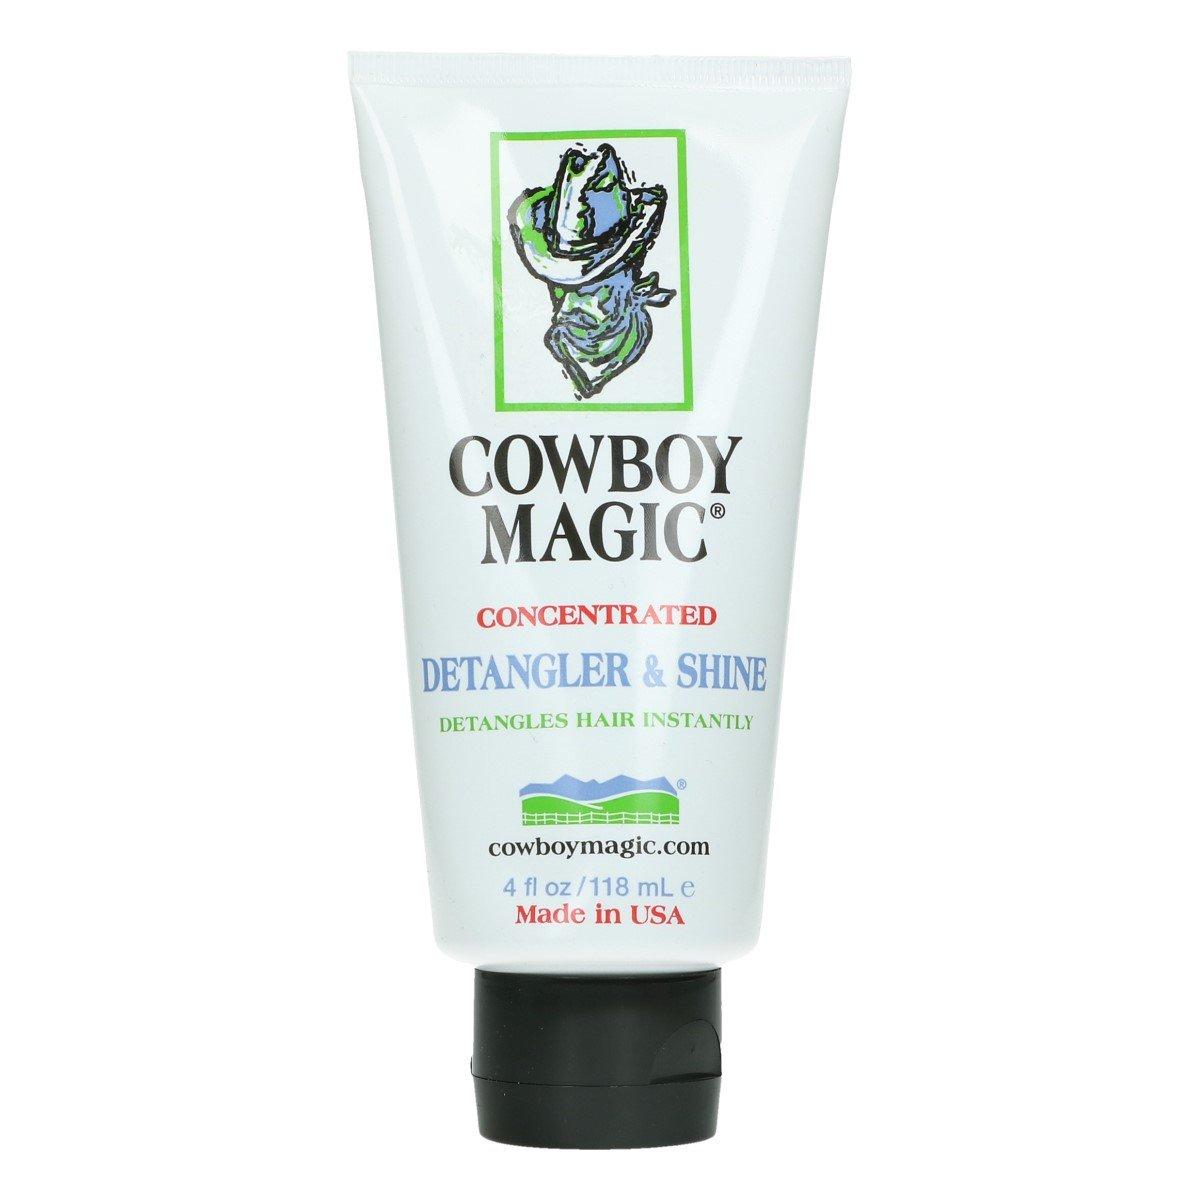 Afbeelding van Cowboy Magic Detangler & Shine 118ml